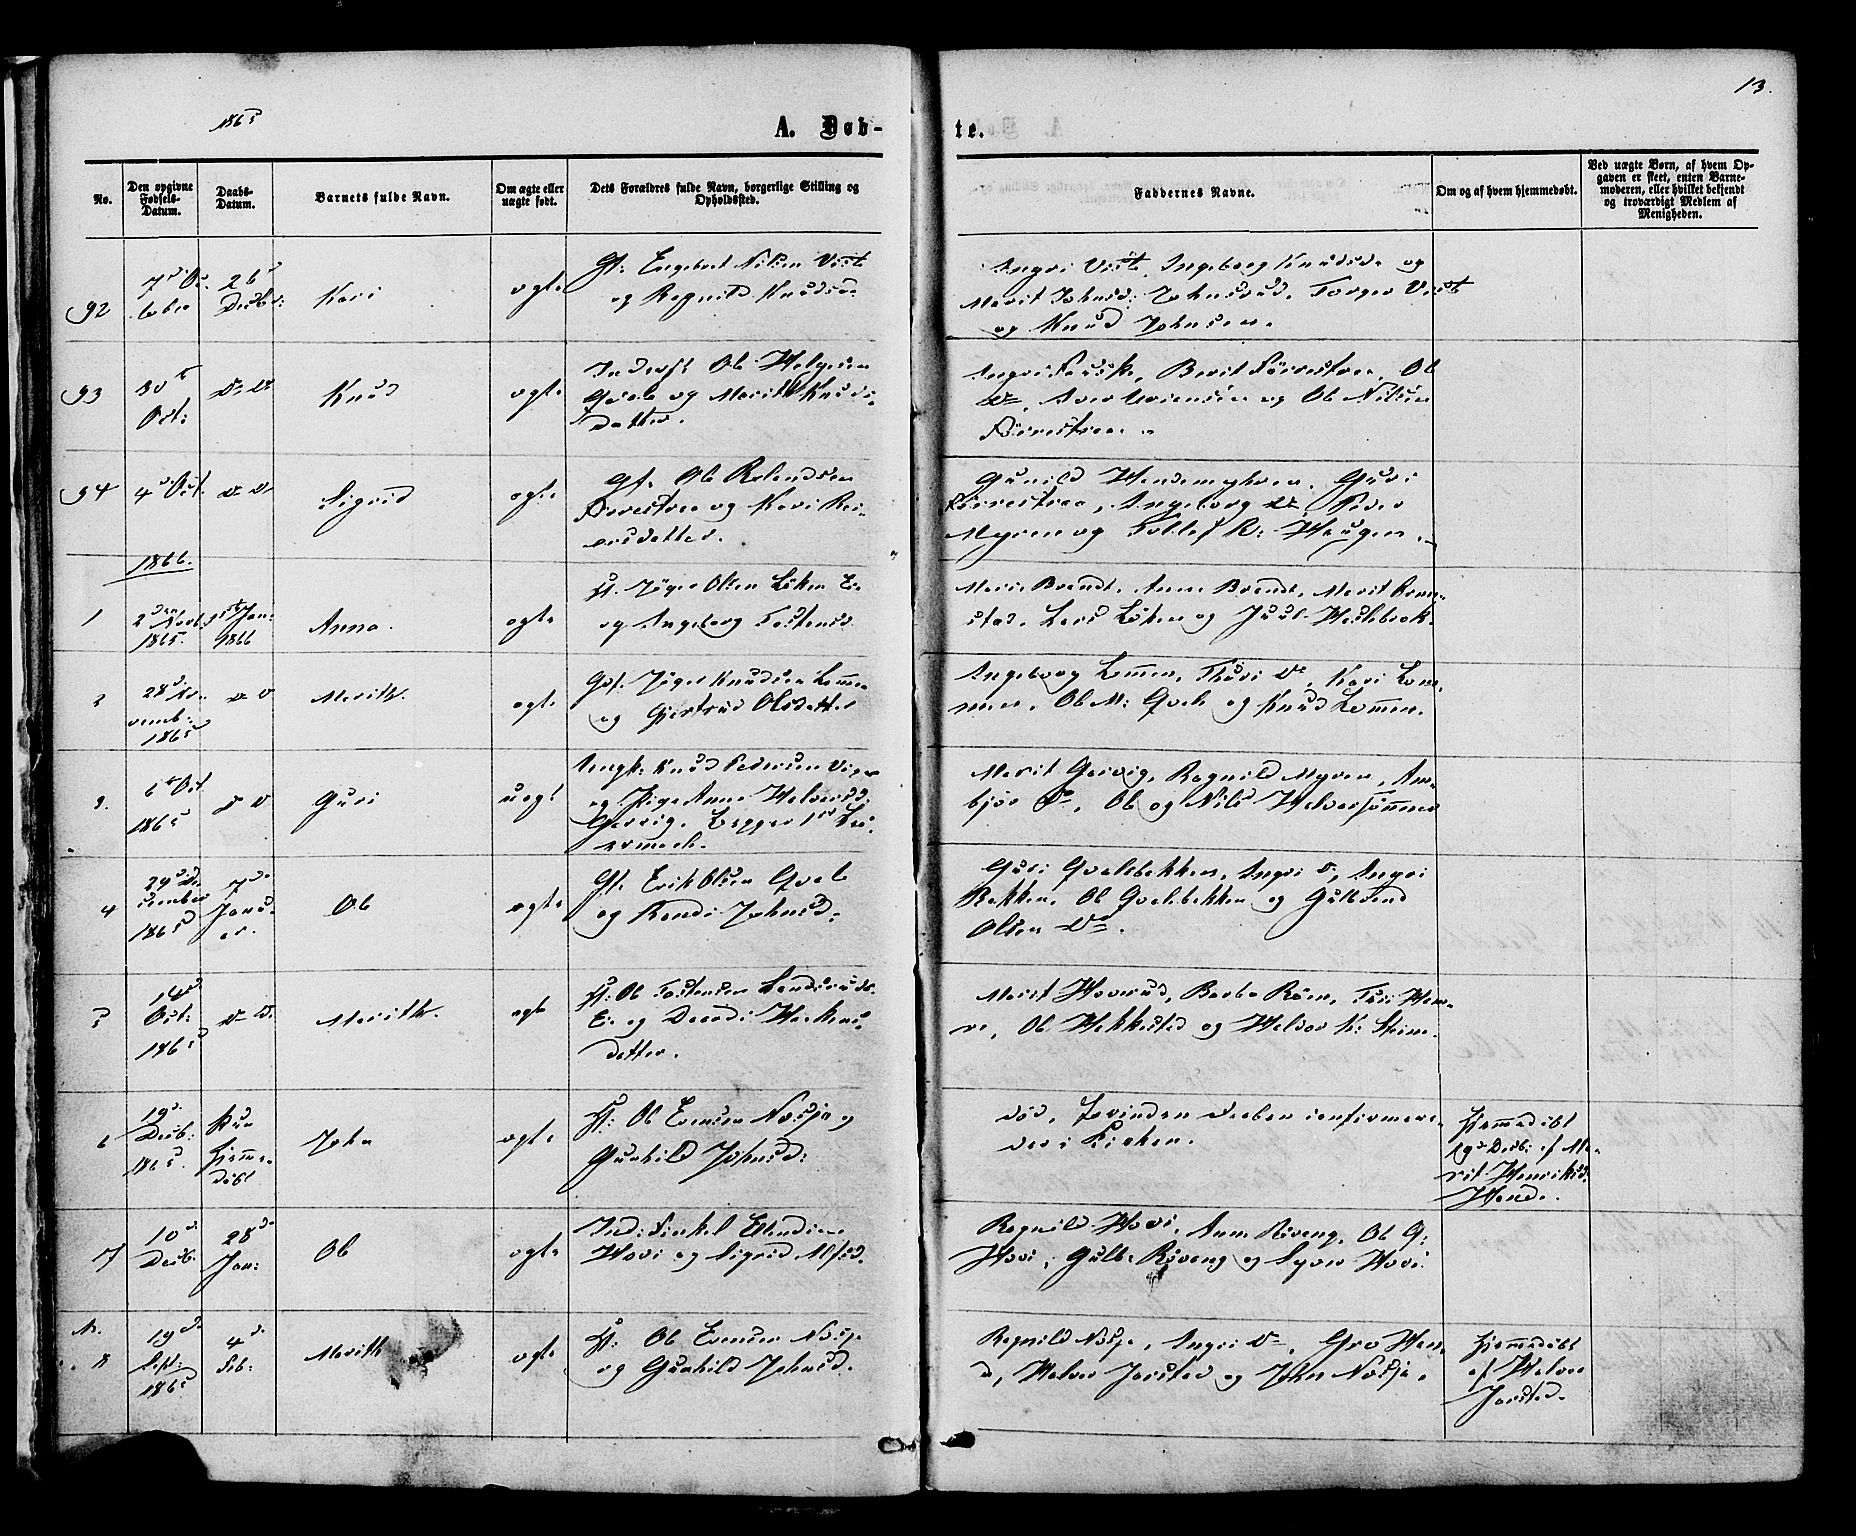 SAH, Vestre Slidre prestekontor, Ministerialbok nr. 3, 1865-1880, s. 13